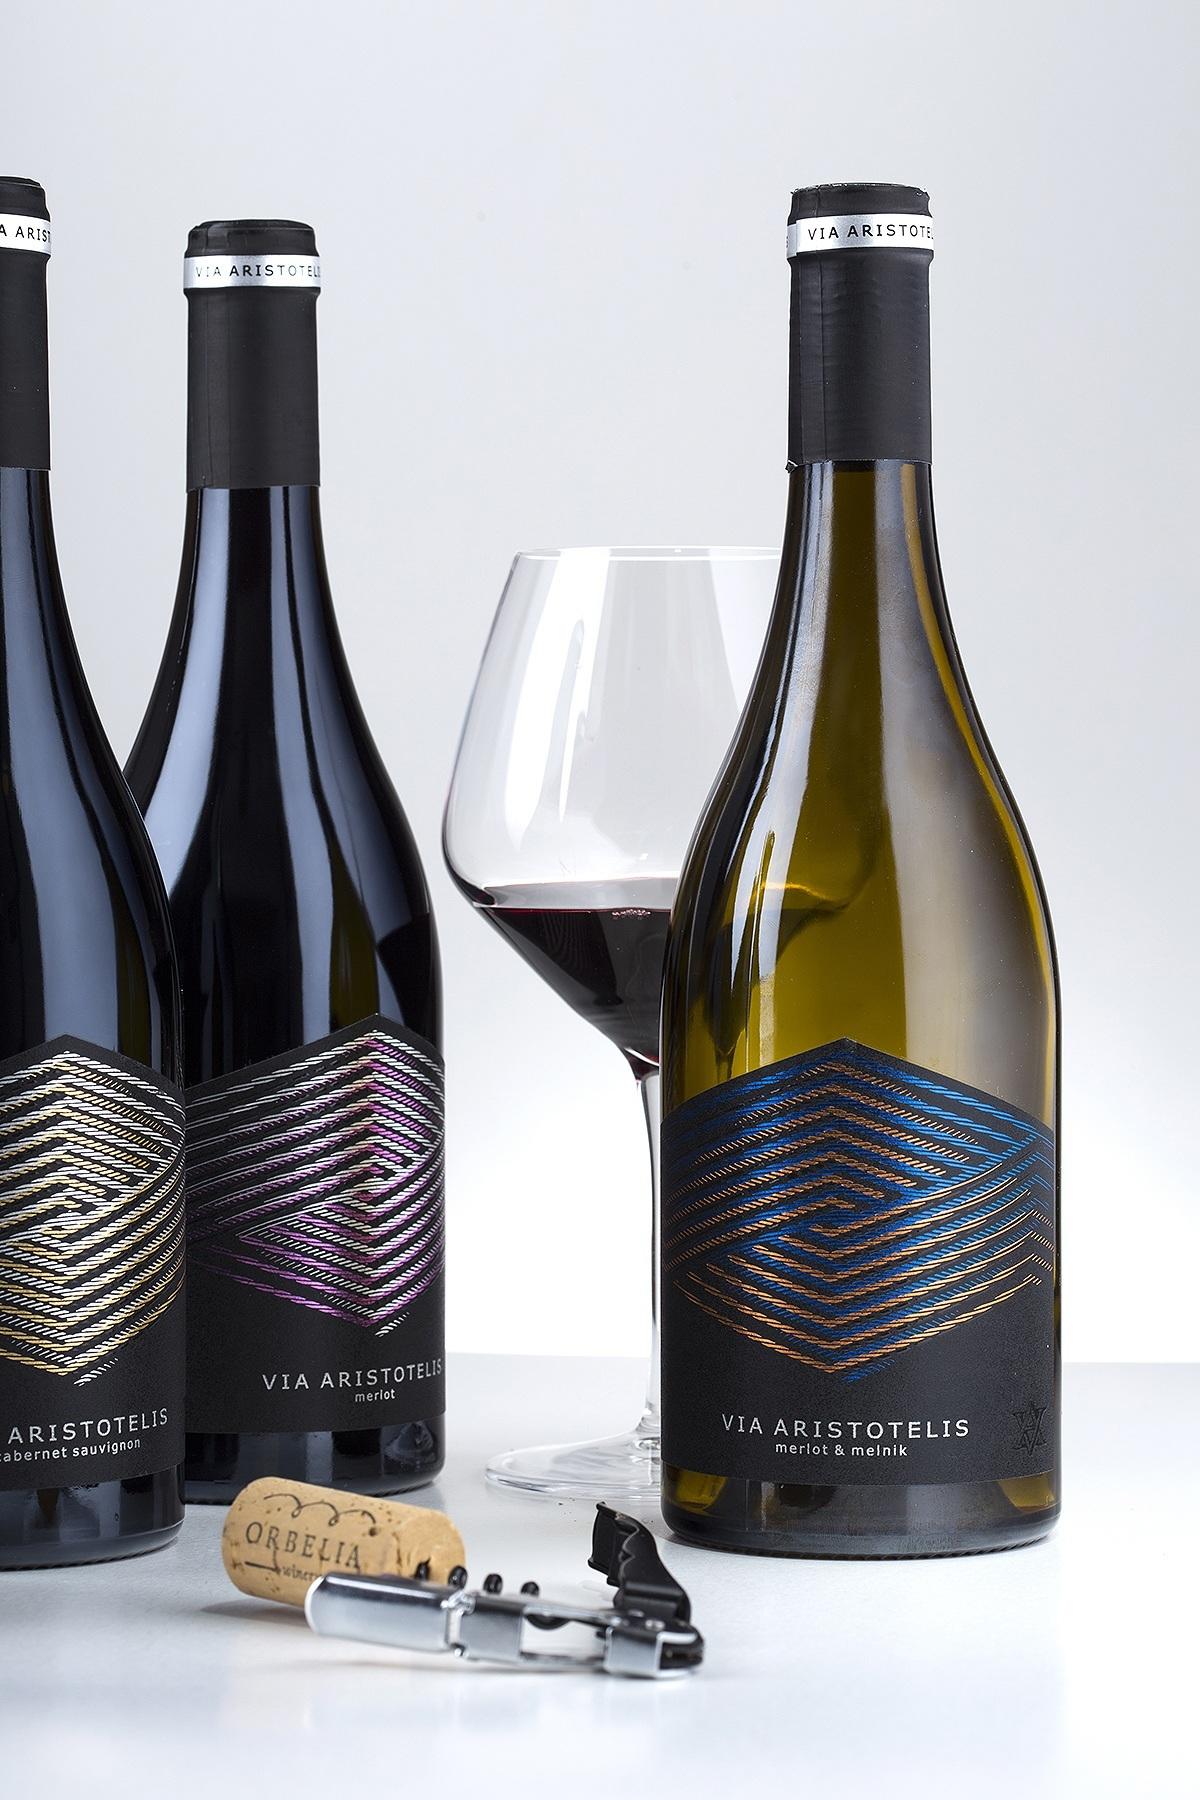 Via Aristotelis wine label